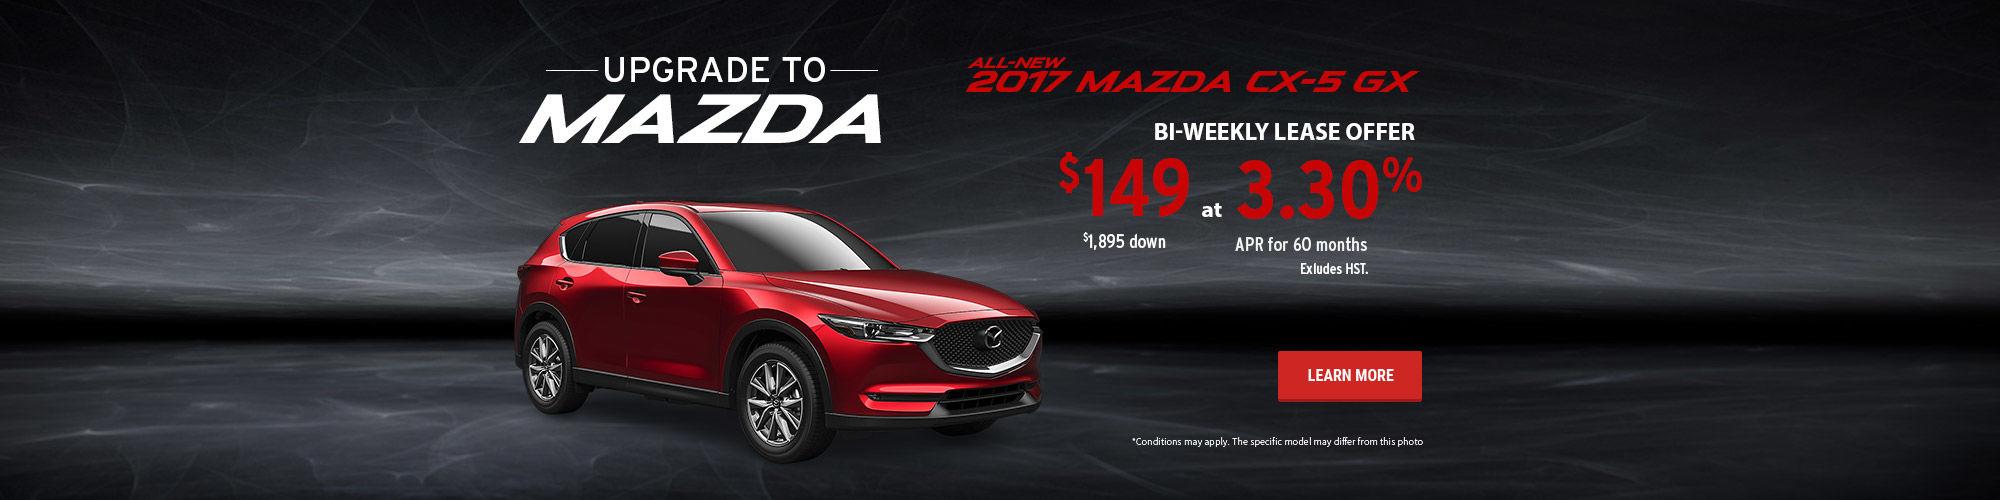 Upgrade to Mazda - CX-5